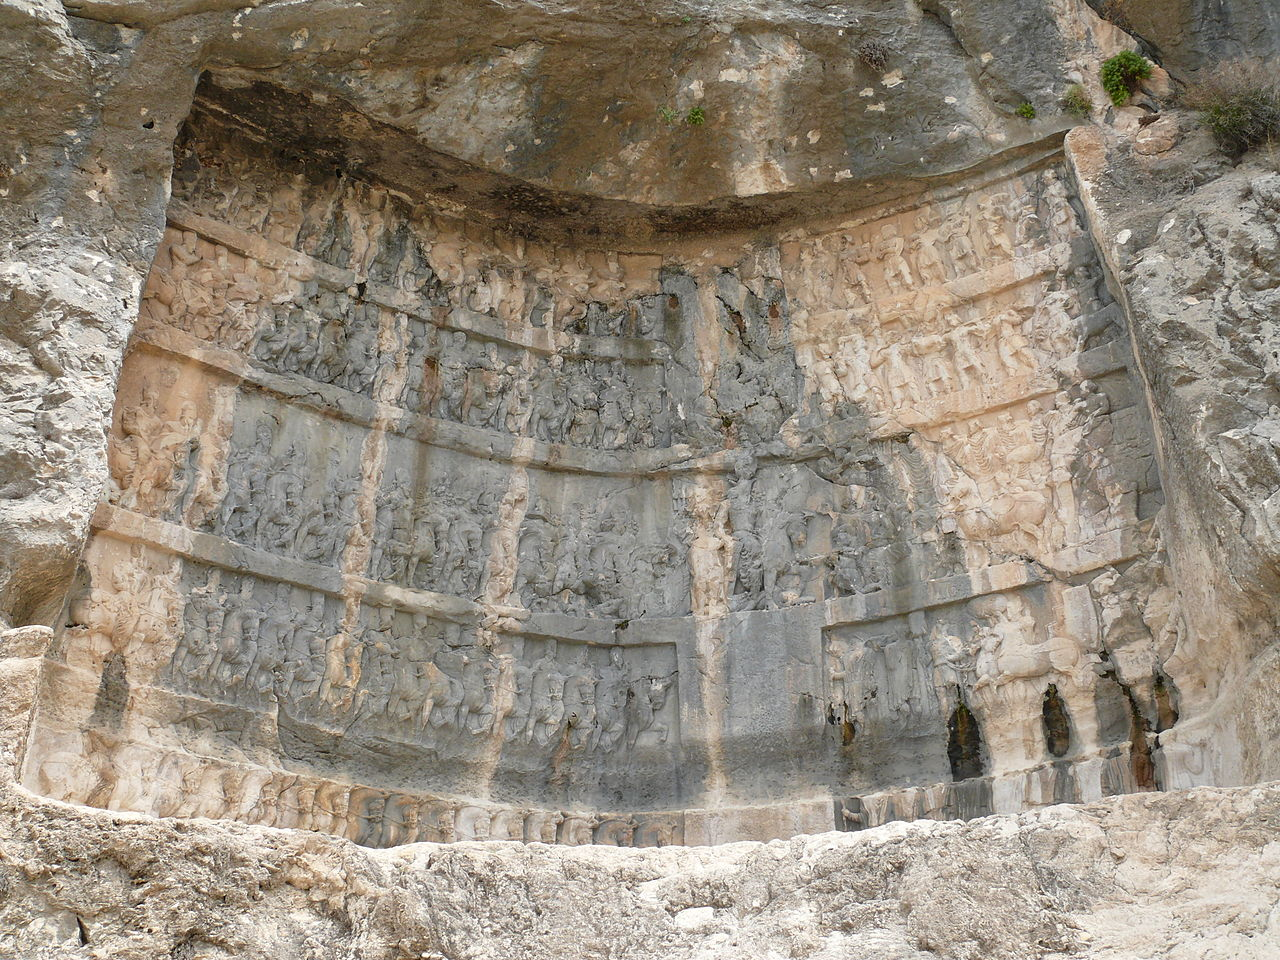 1280px-Bishapur_III_relief_Shapur.JPG